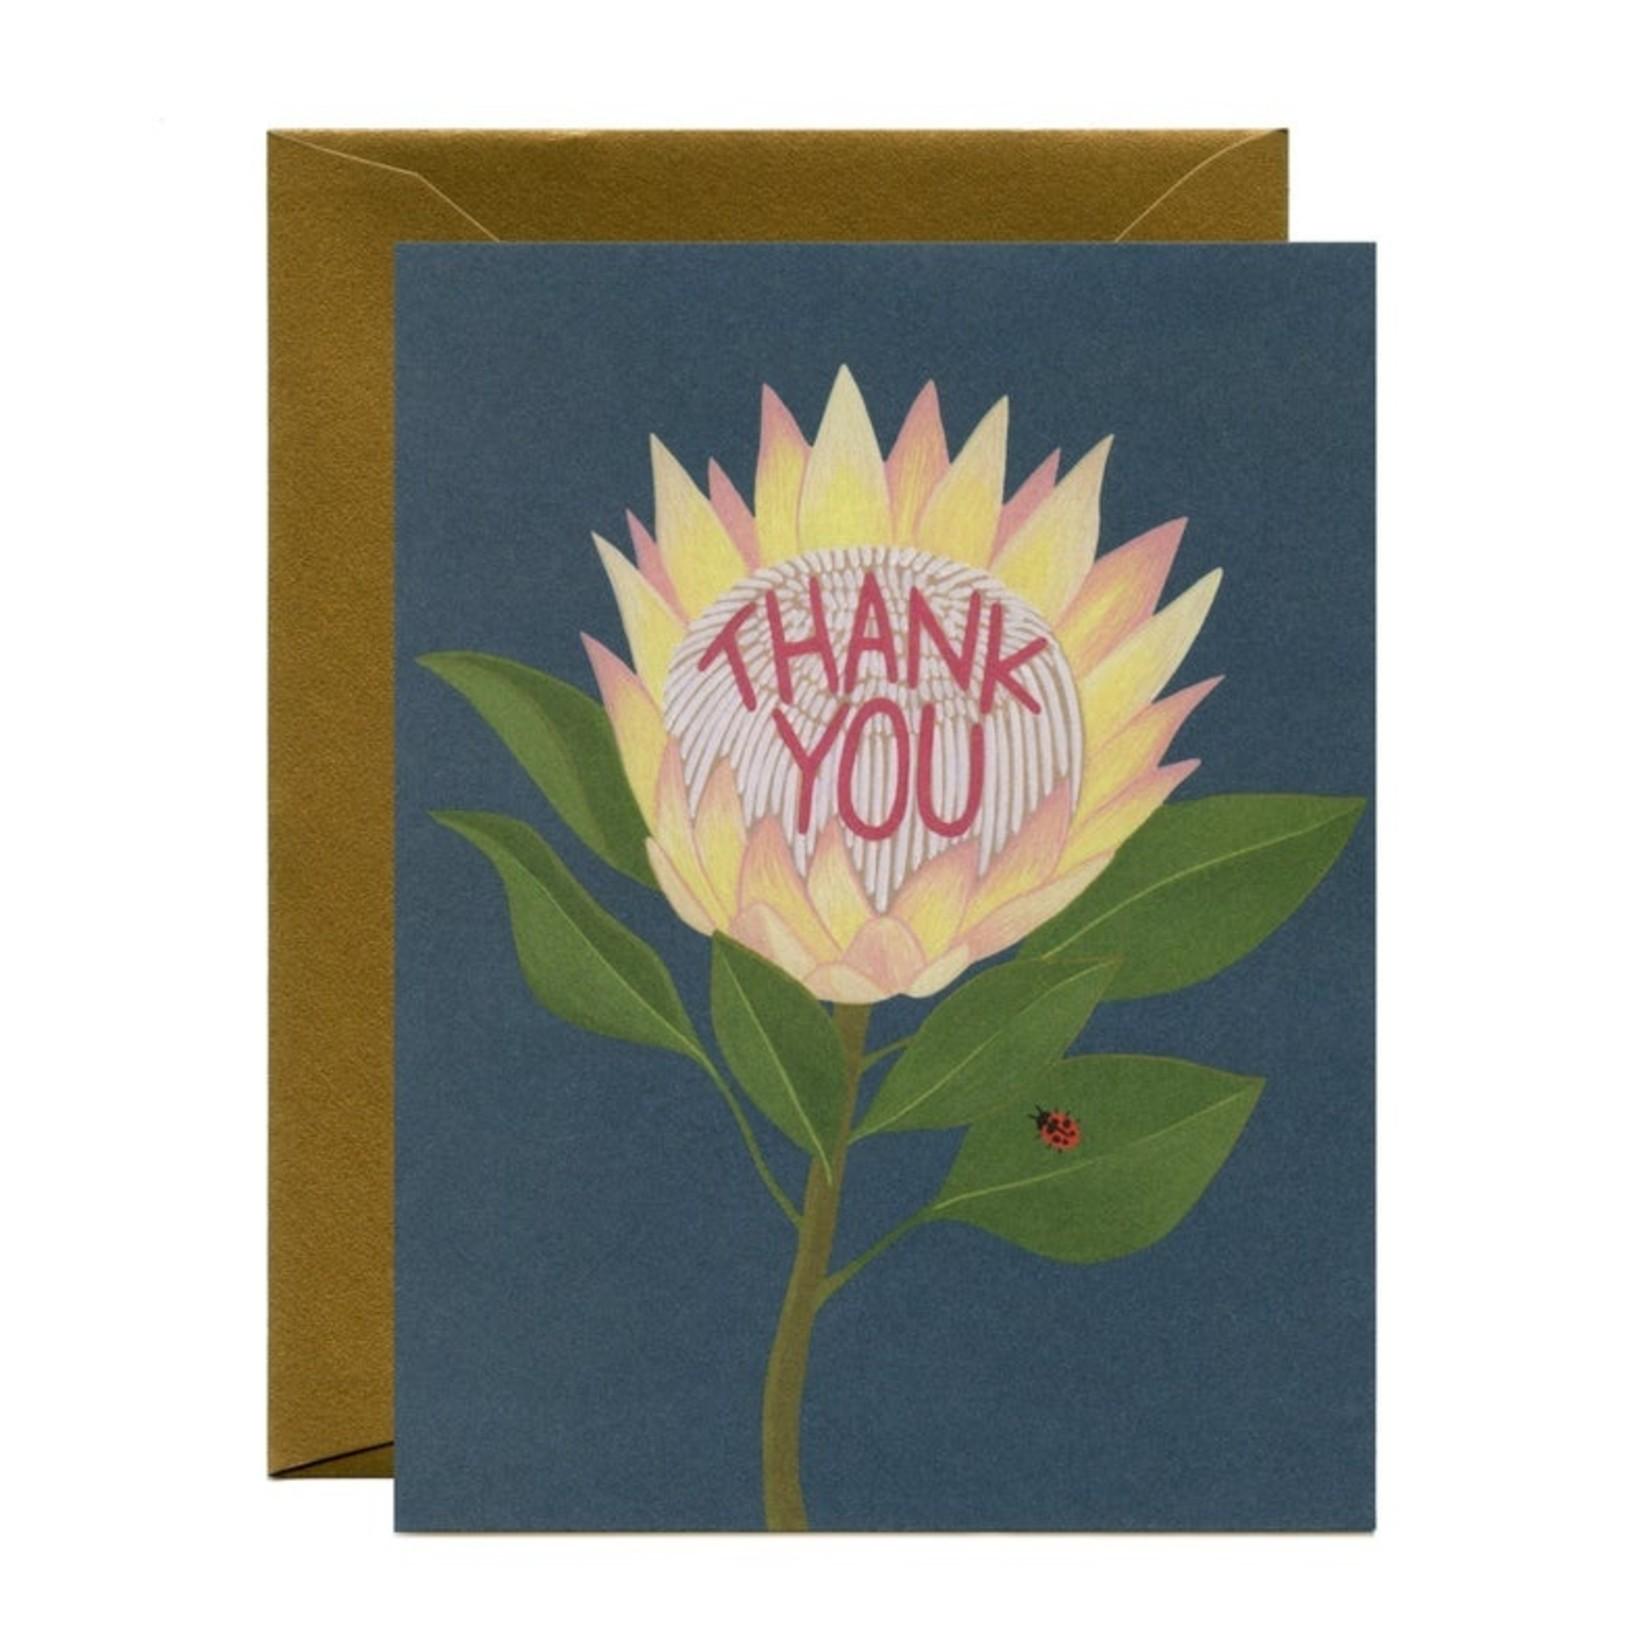 Thank You Card: Sunflower